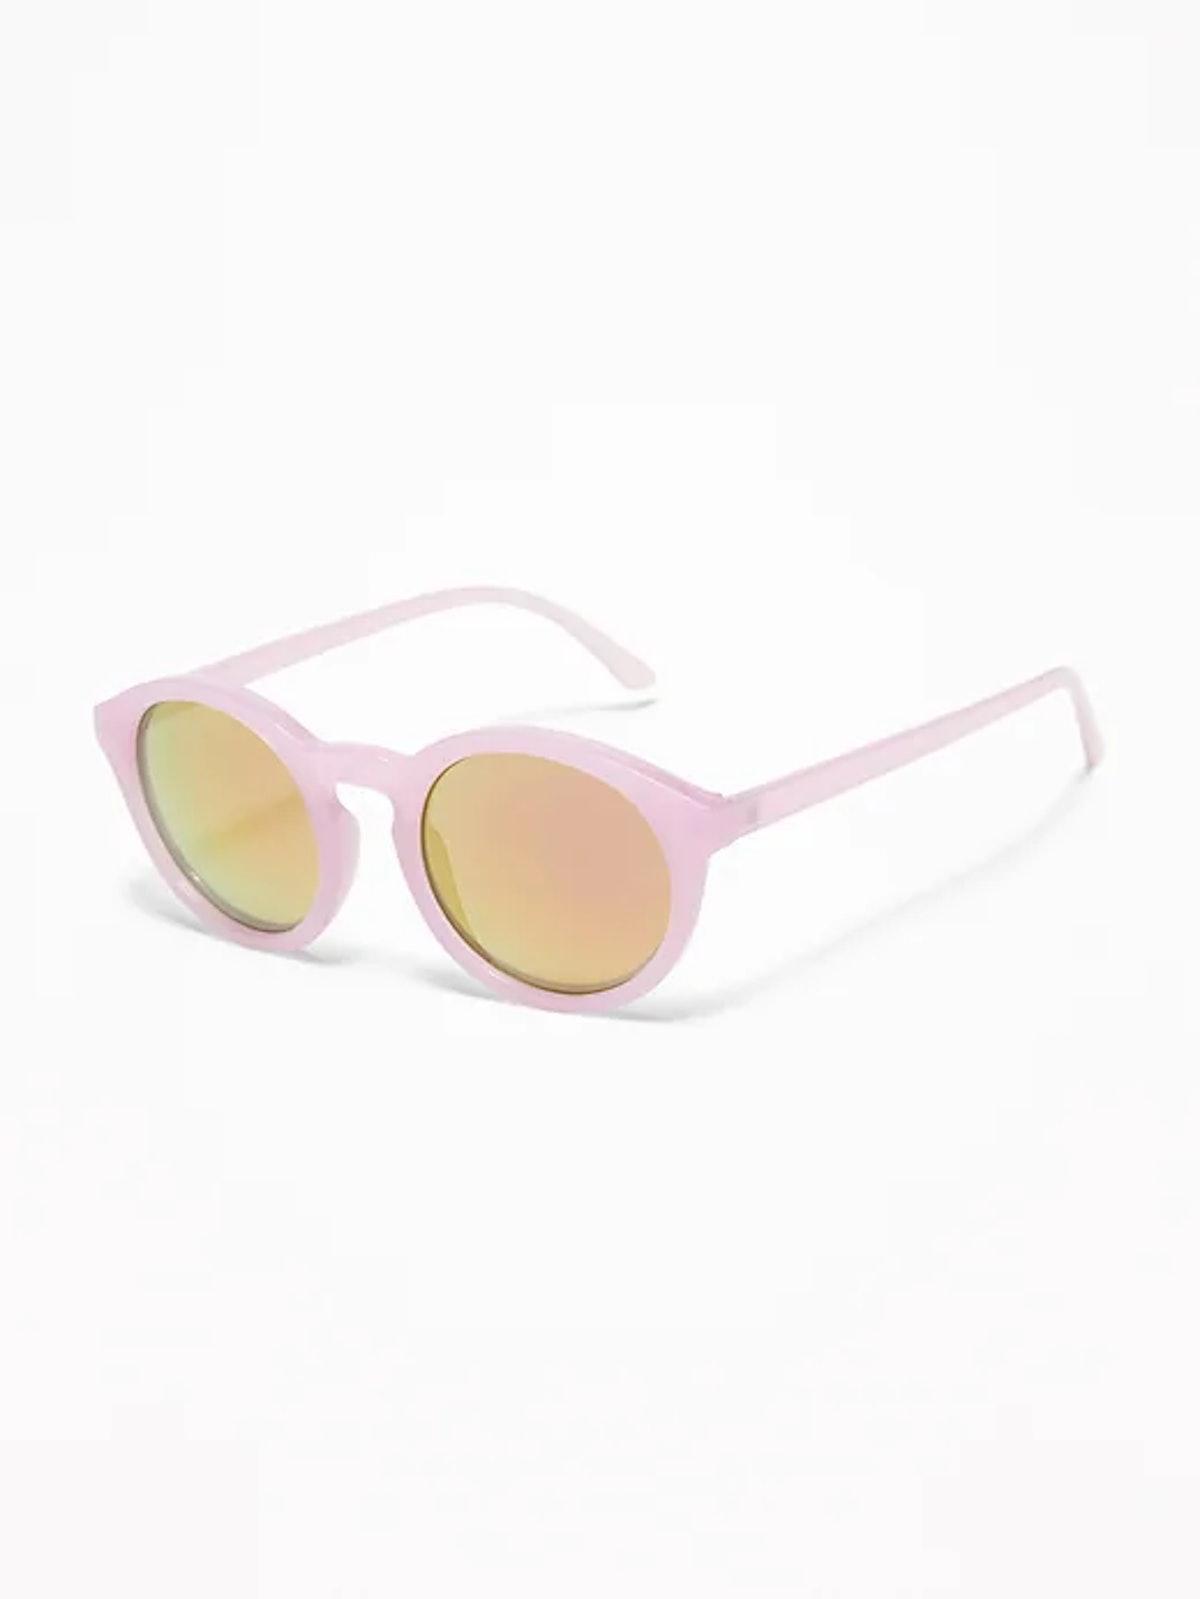 Round Color-Frame Sunglasses for Women